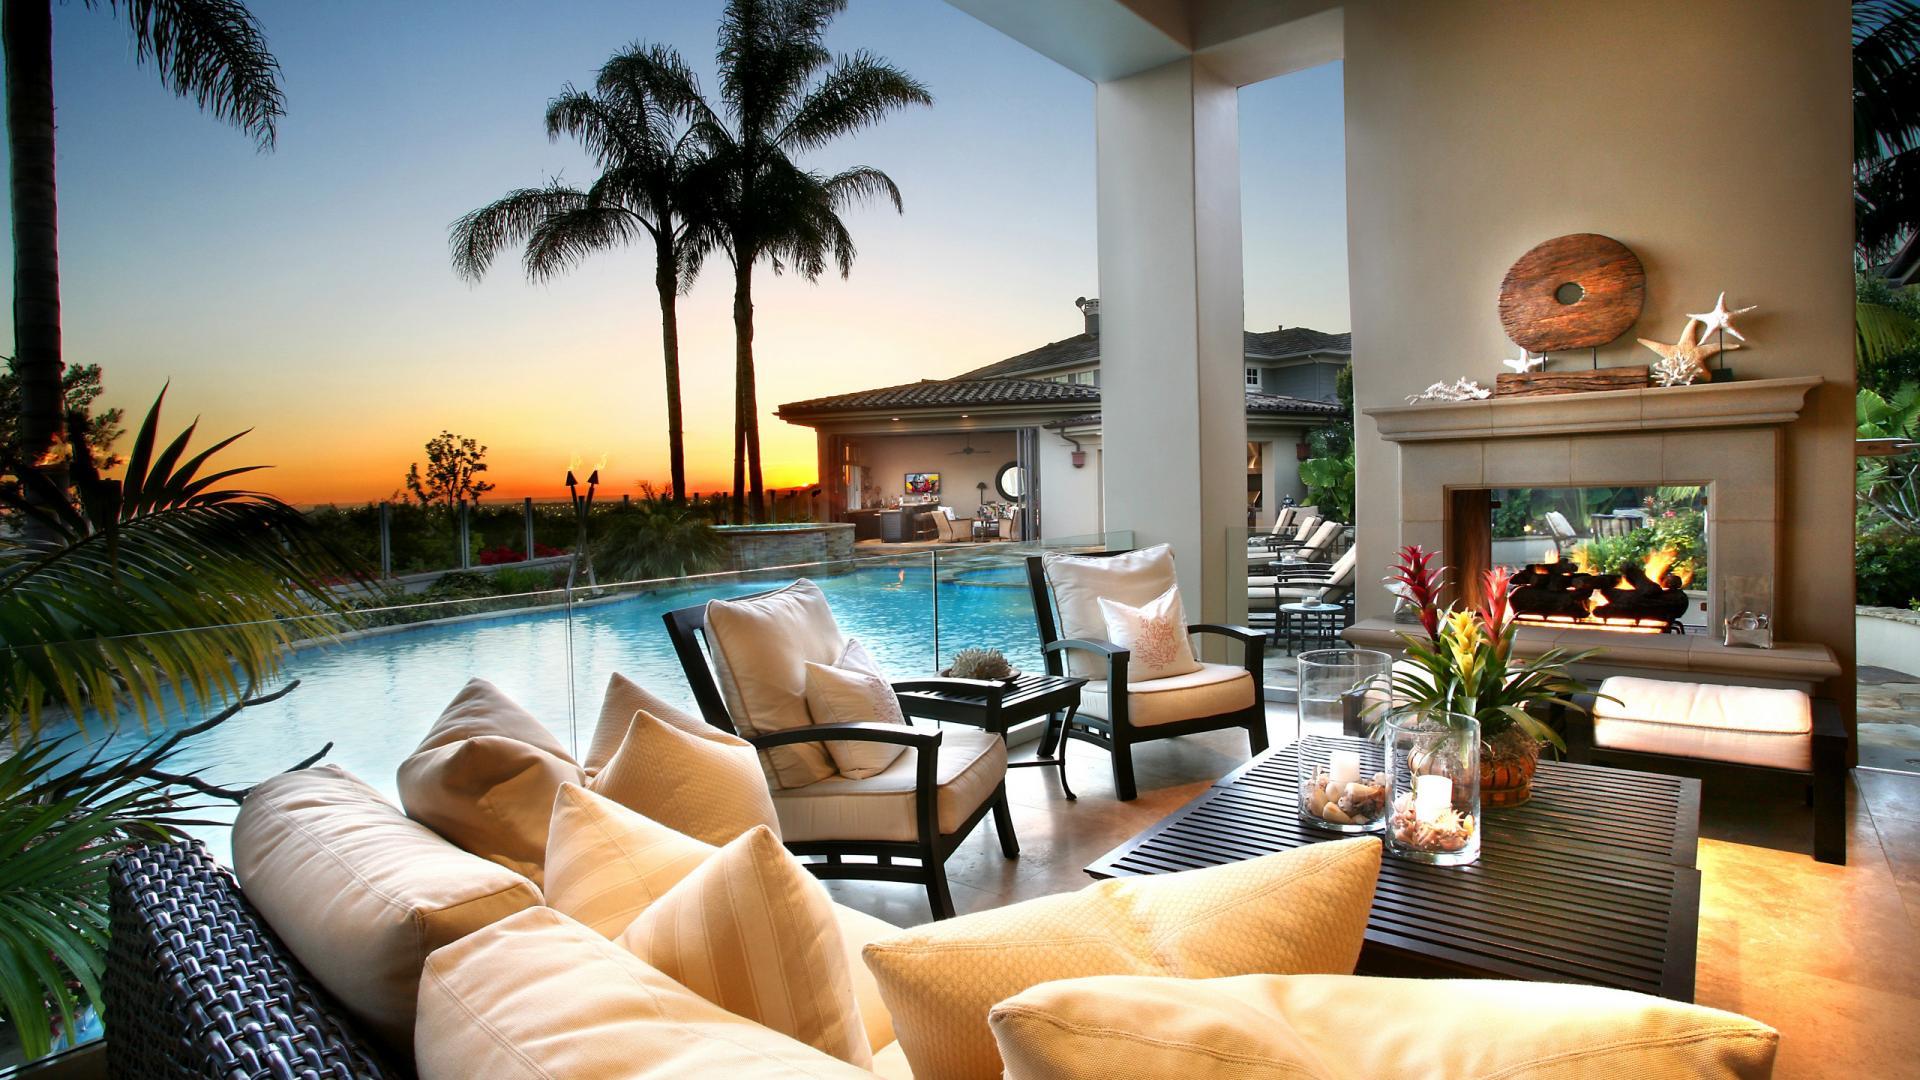 Luxury Home Wallpaper 24140 1920x1080px 1920x1080